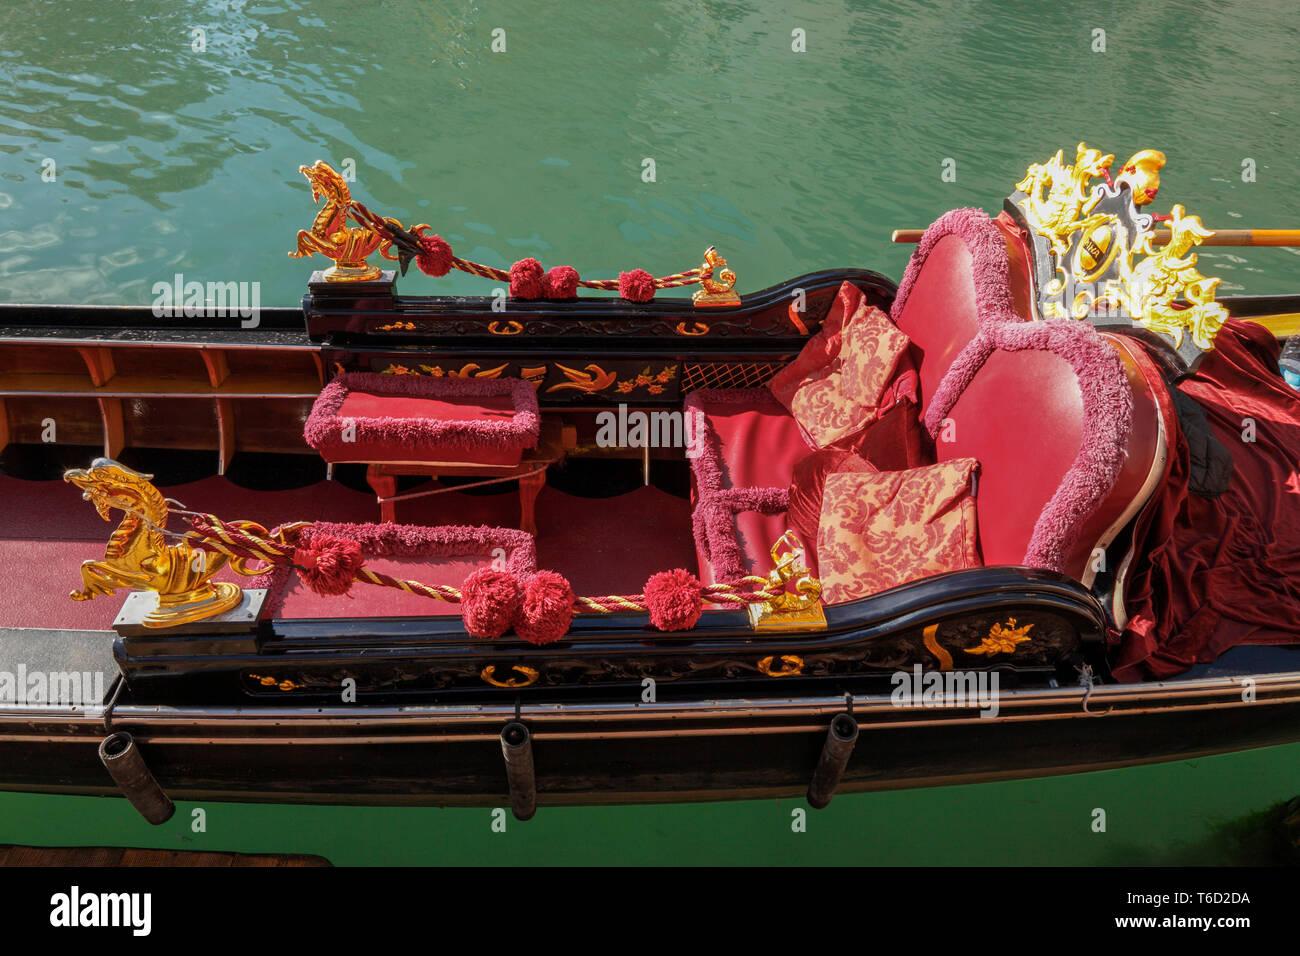 Góndola decorativa, Venecia; Véneto, Italia, Europa. Imagen De Stock